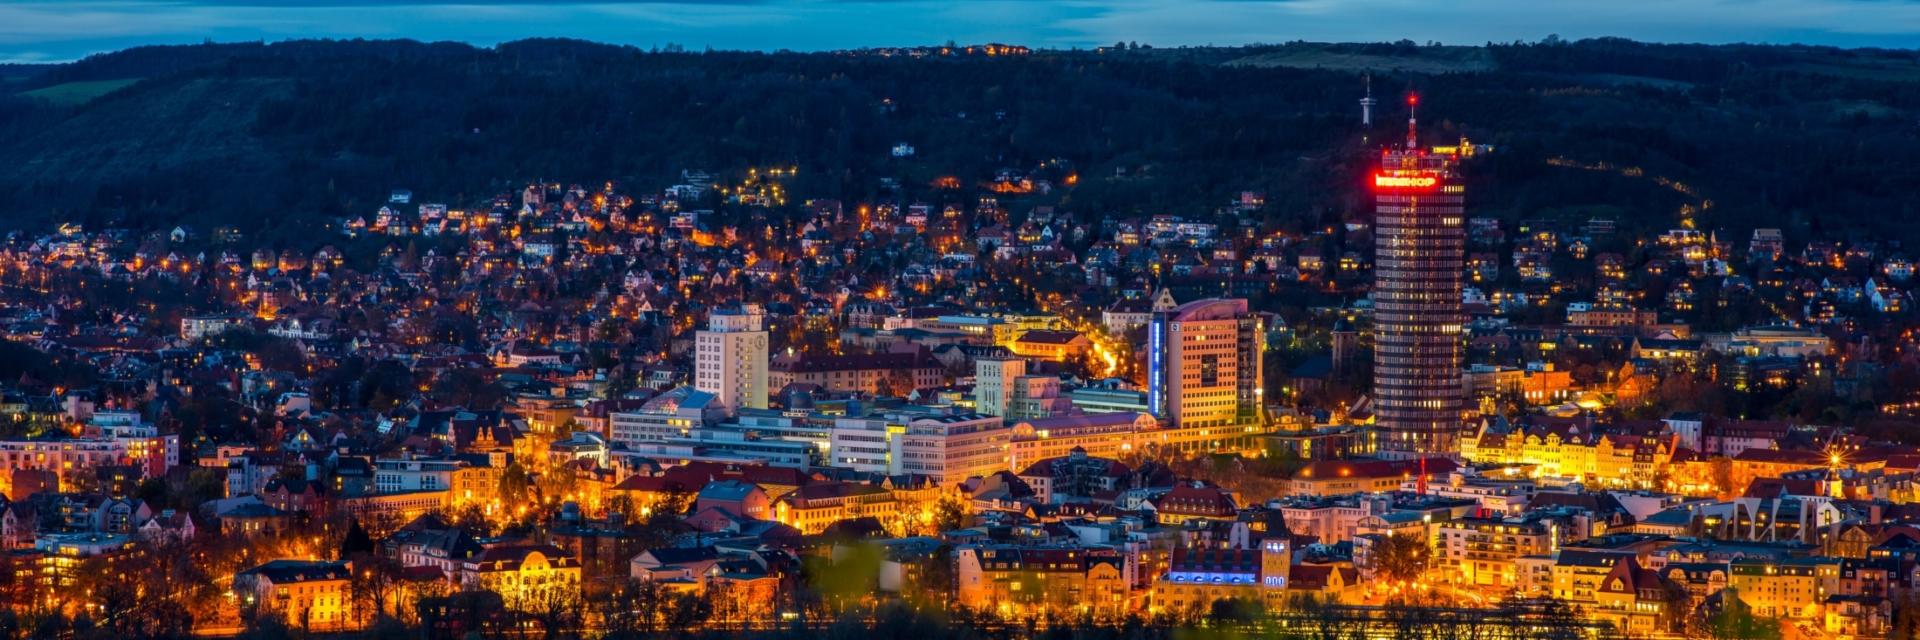 Einblick-Ausblick-Lichtblick: Blaue Stunde über der Innenstadt Jenas © JenaKultur, Foto: Christian Häcker